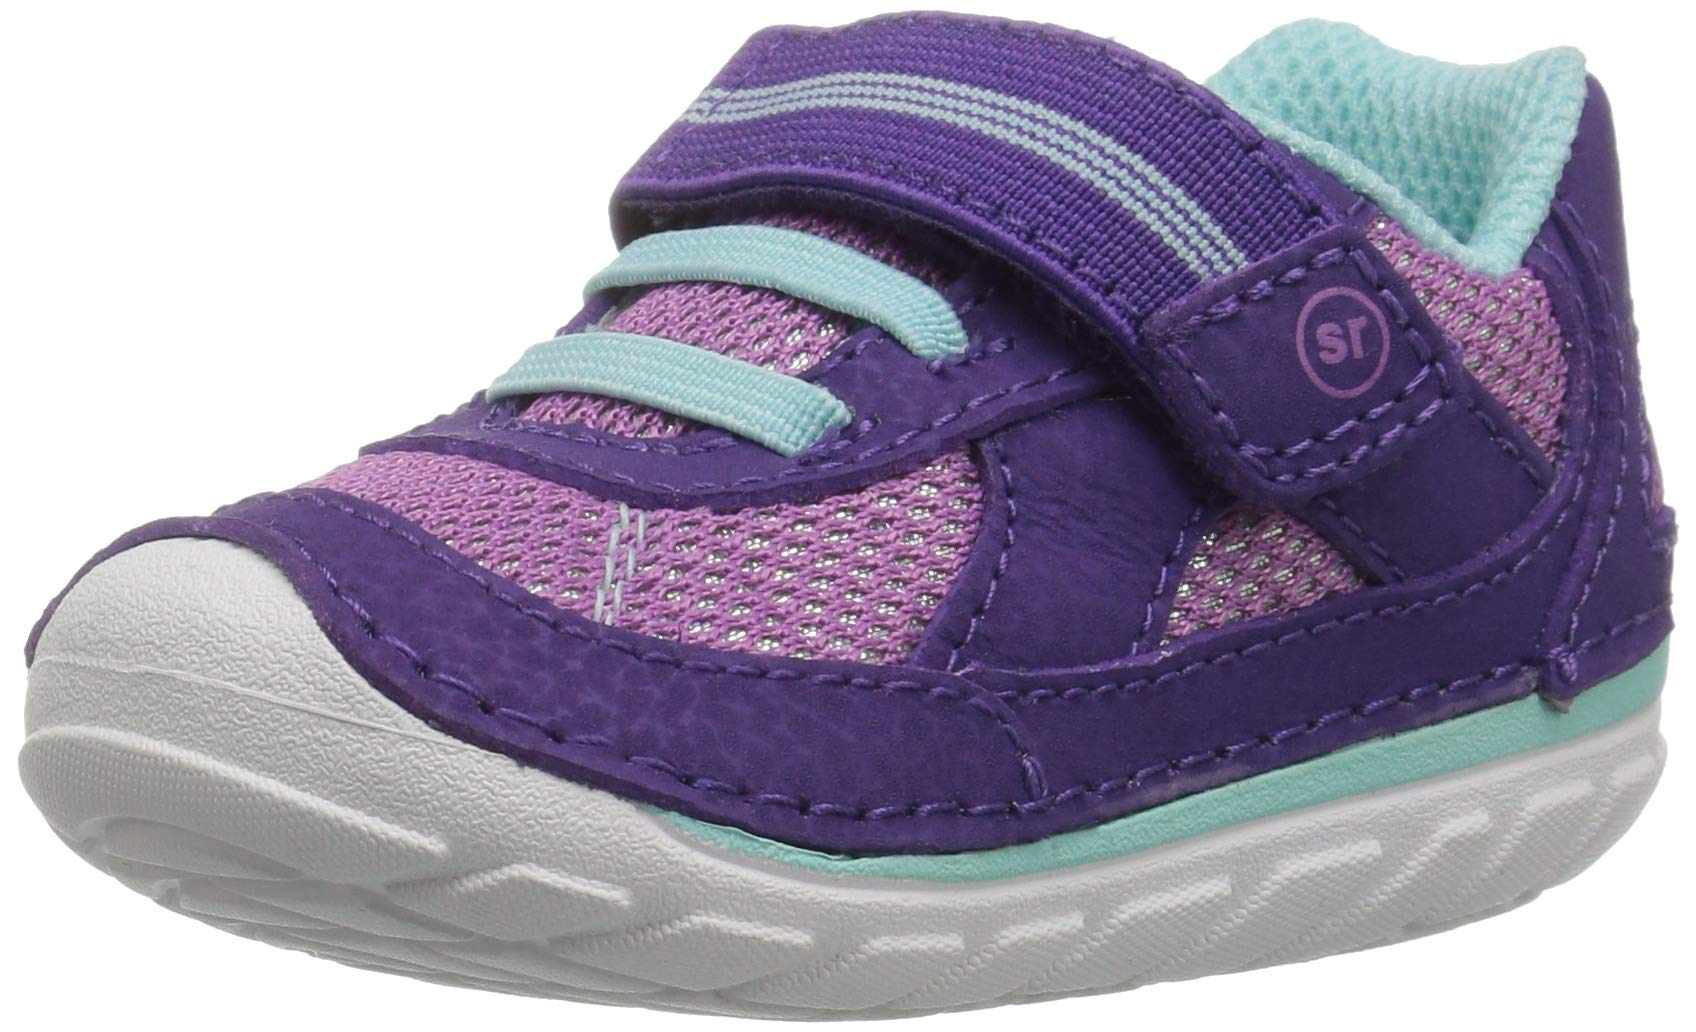 Stride Rite Girls' Soft Motion Jamie Sneaker, Purple 3.5 M US Infant